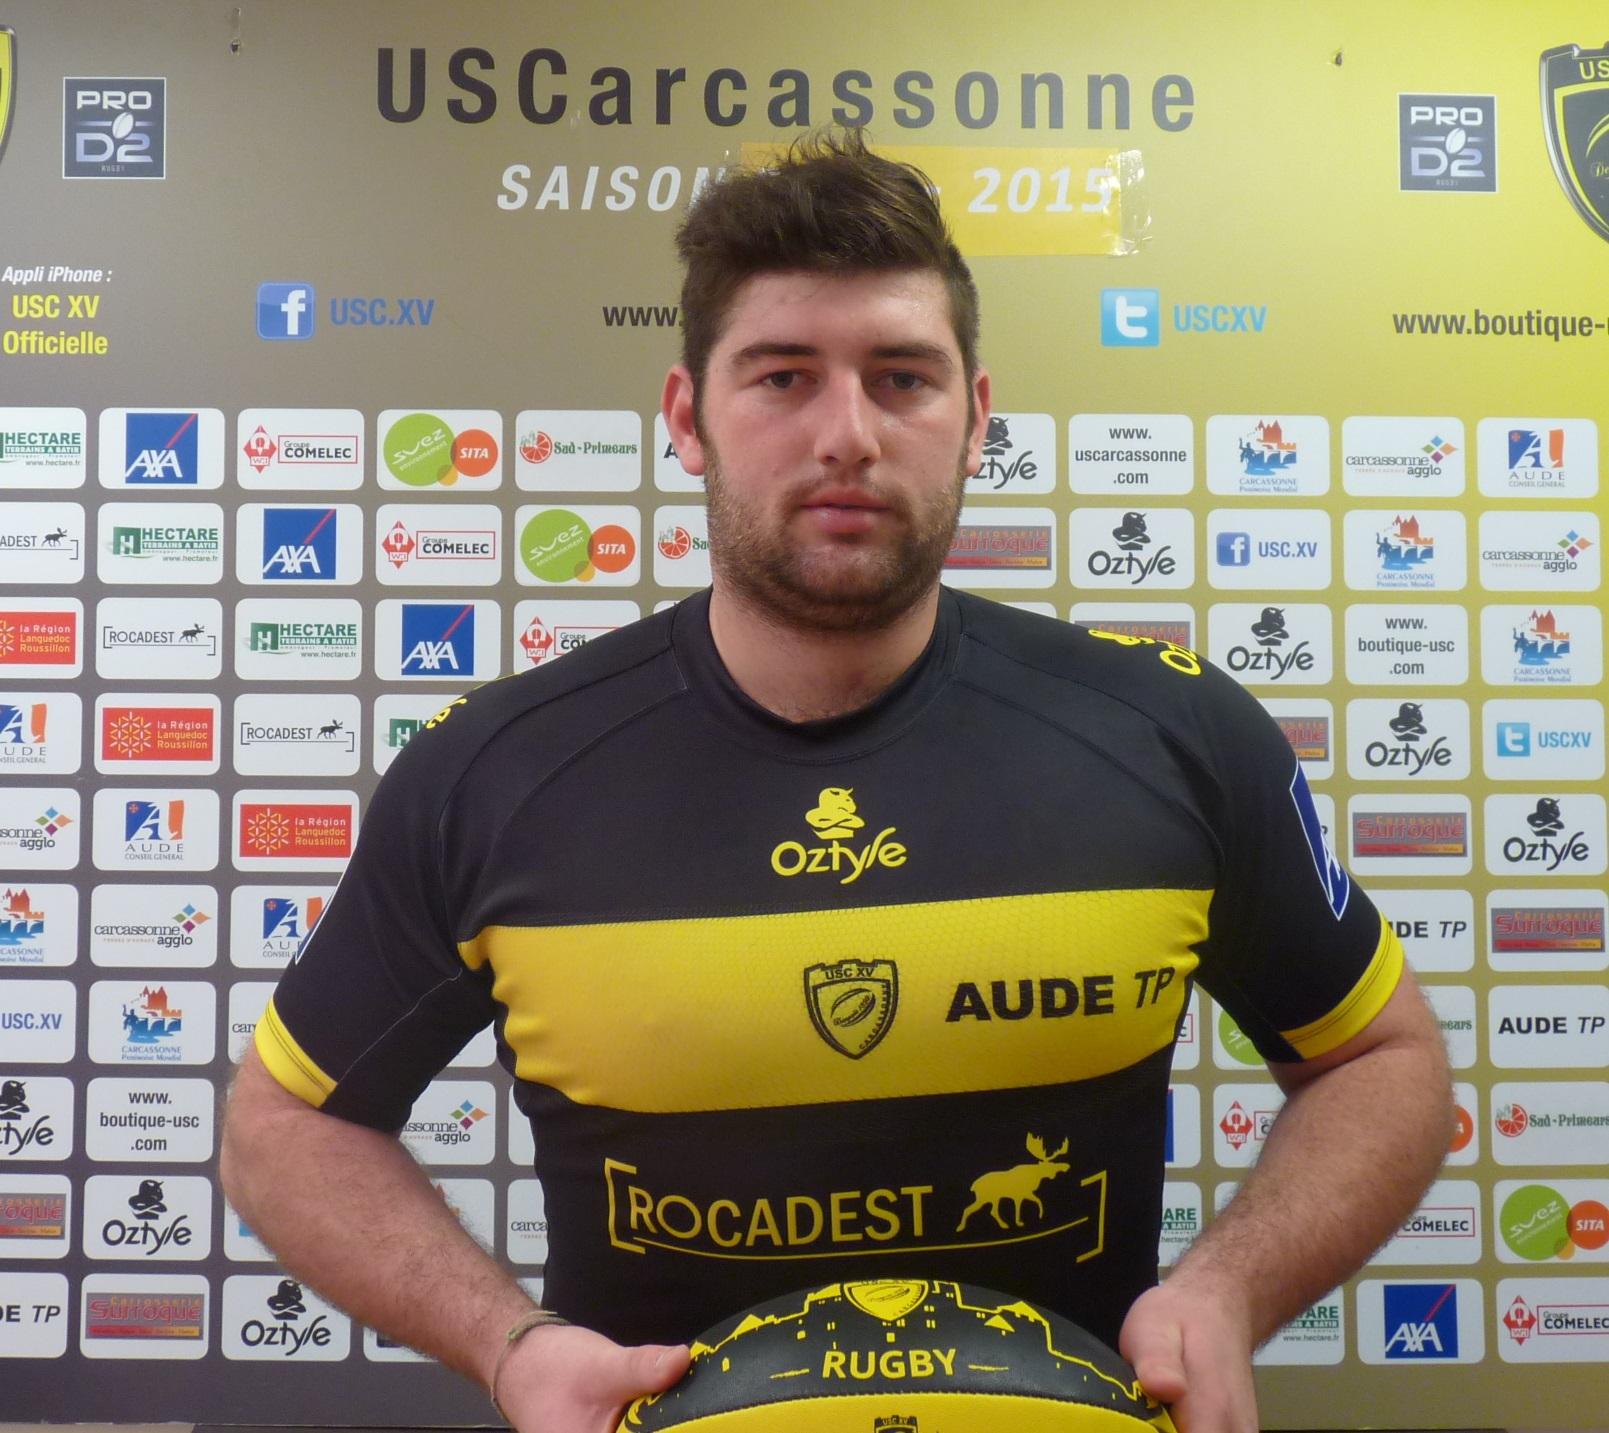 CF - José Ramon Ayarza